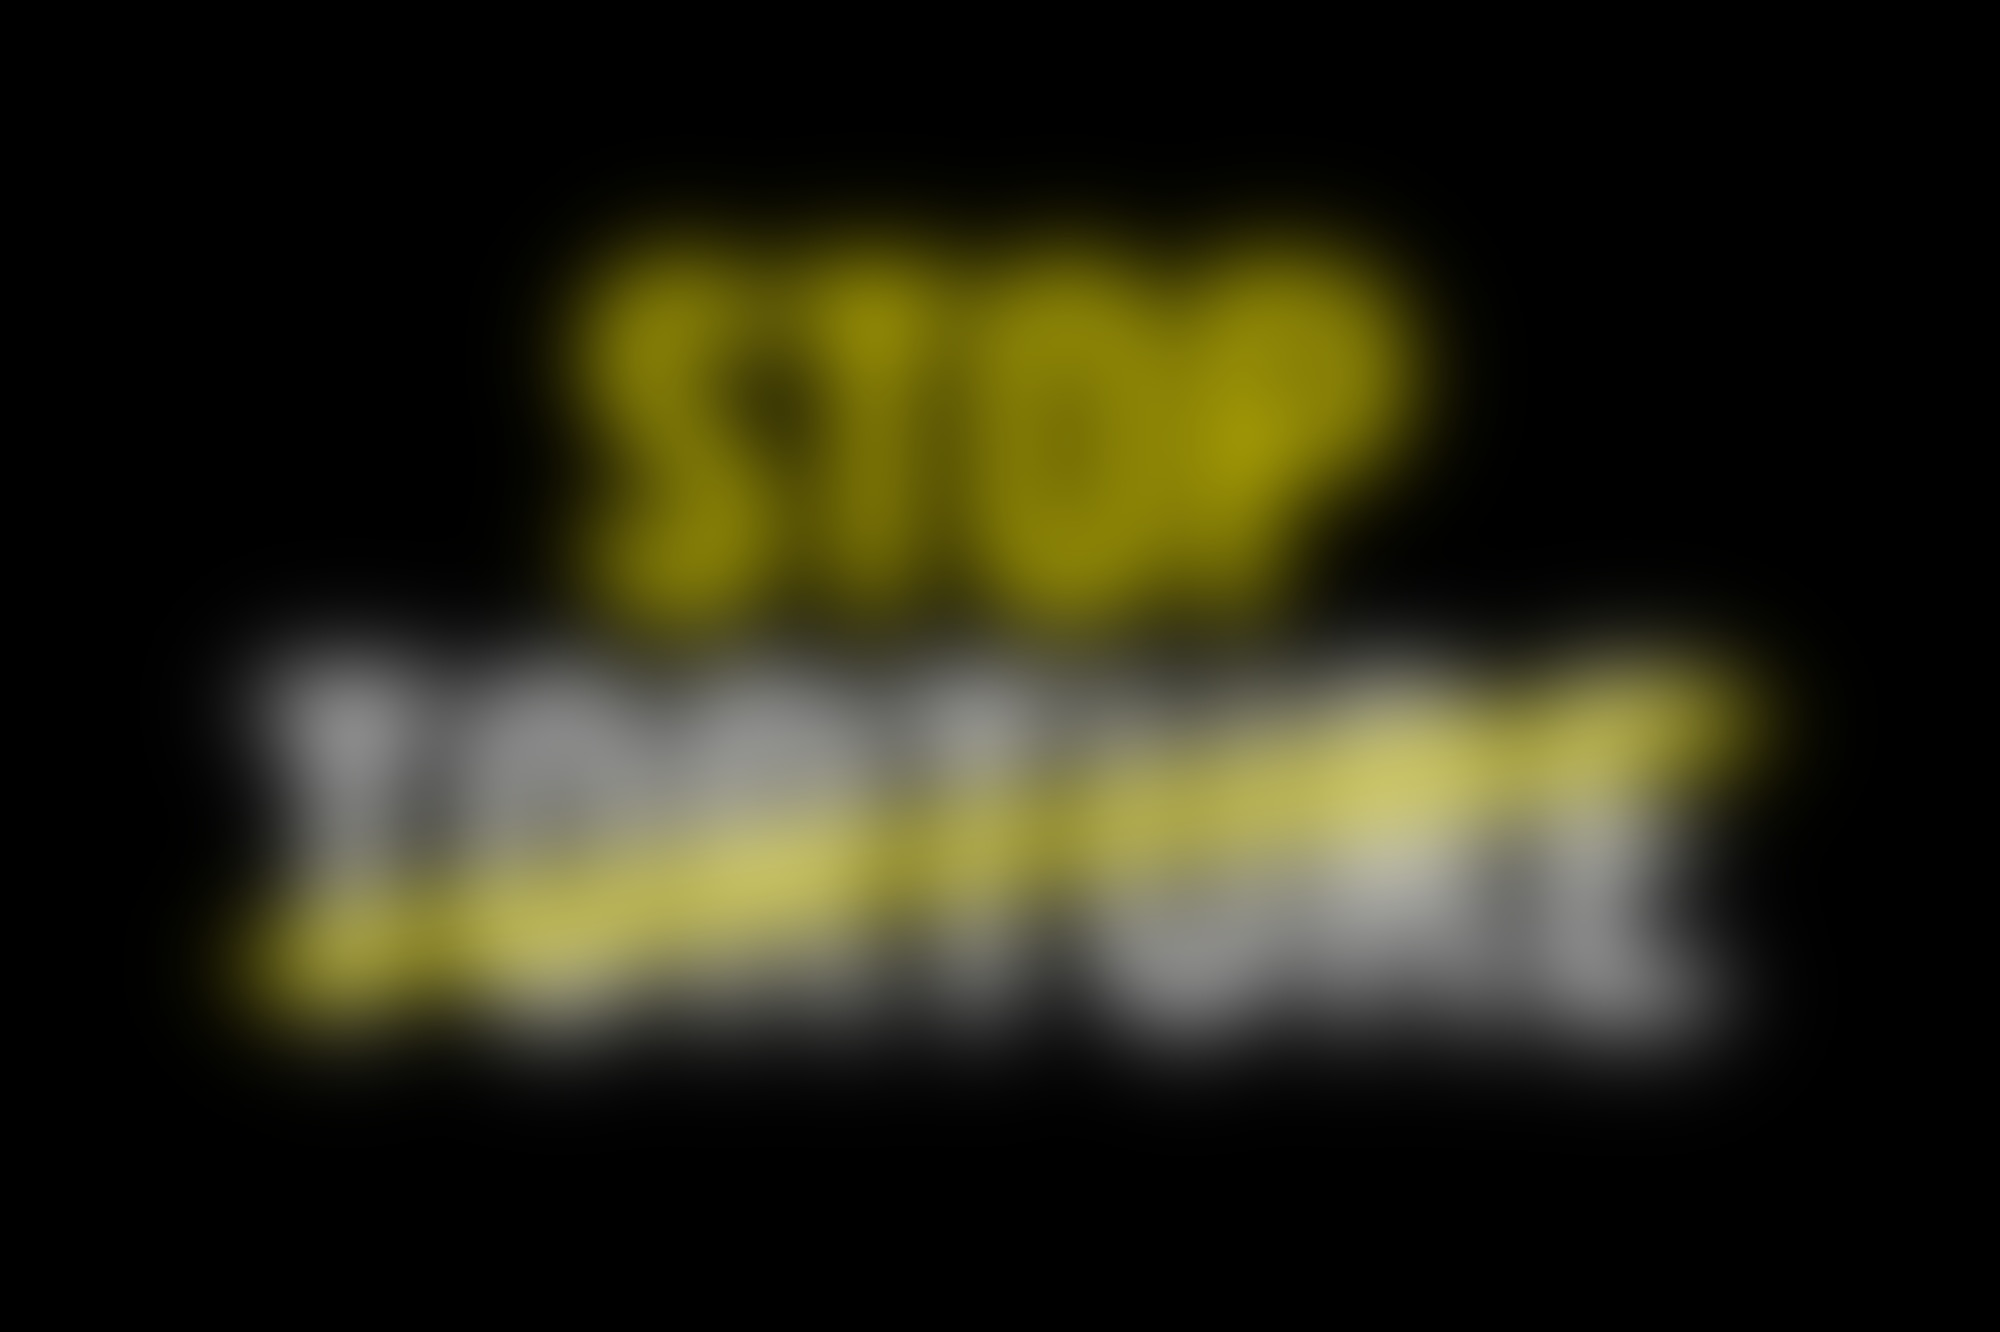 Torture word mark autocompressfitresizeixlibphp 1 1 0max h2000max w3 D2000q80s6e8889a2a6136d3c5f0e5ce0498cb386